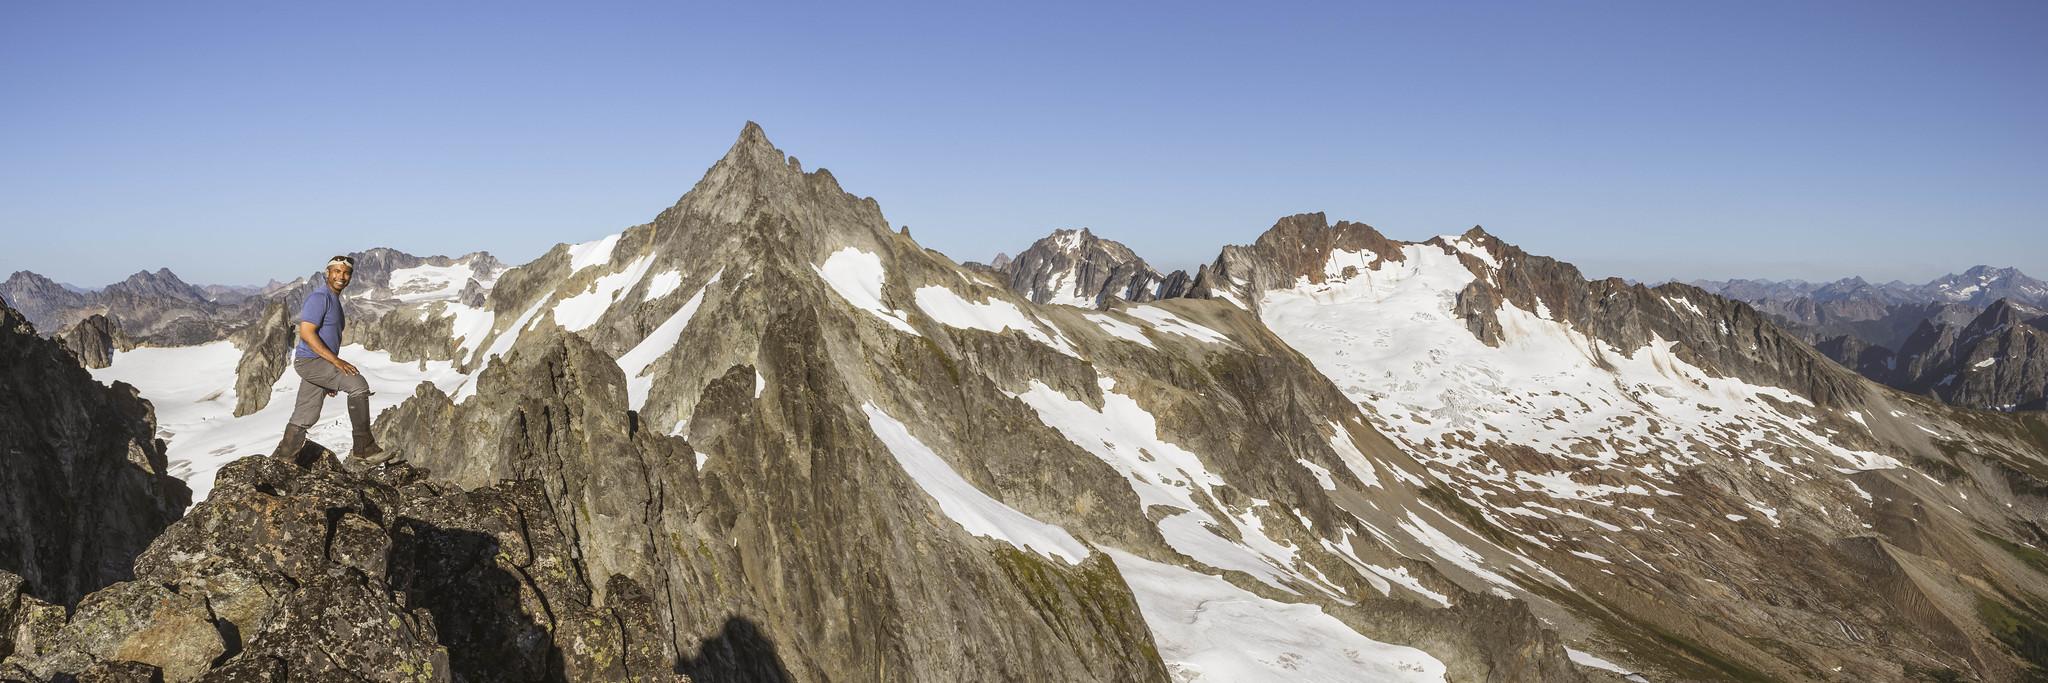 Kodak moment panoramic view on Mount Torment